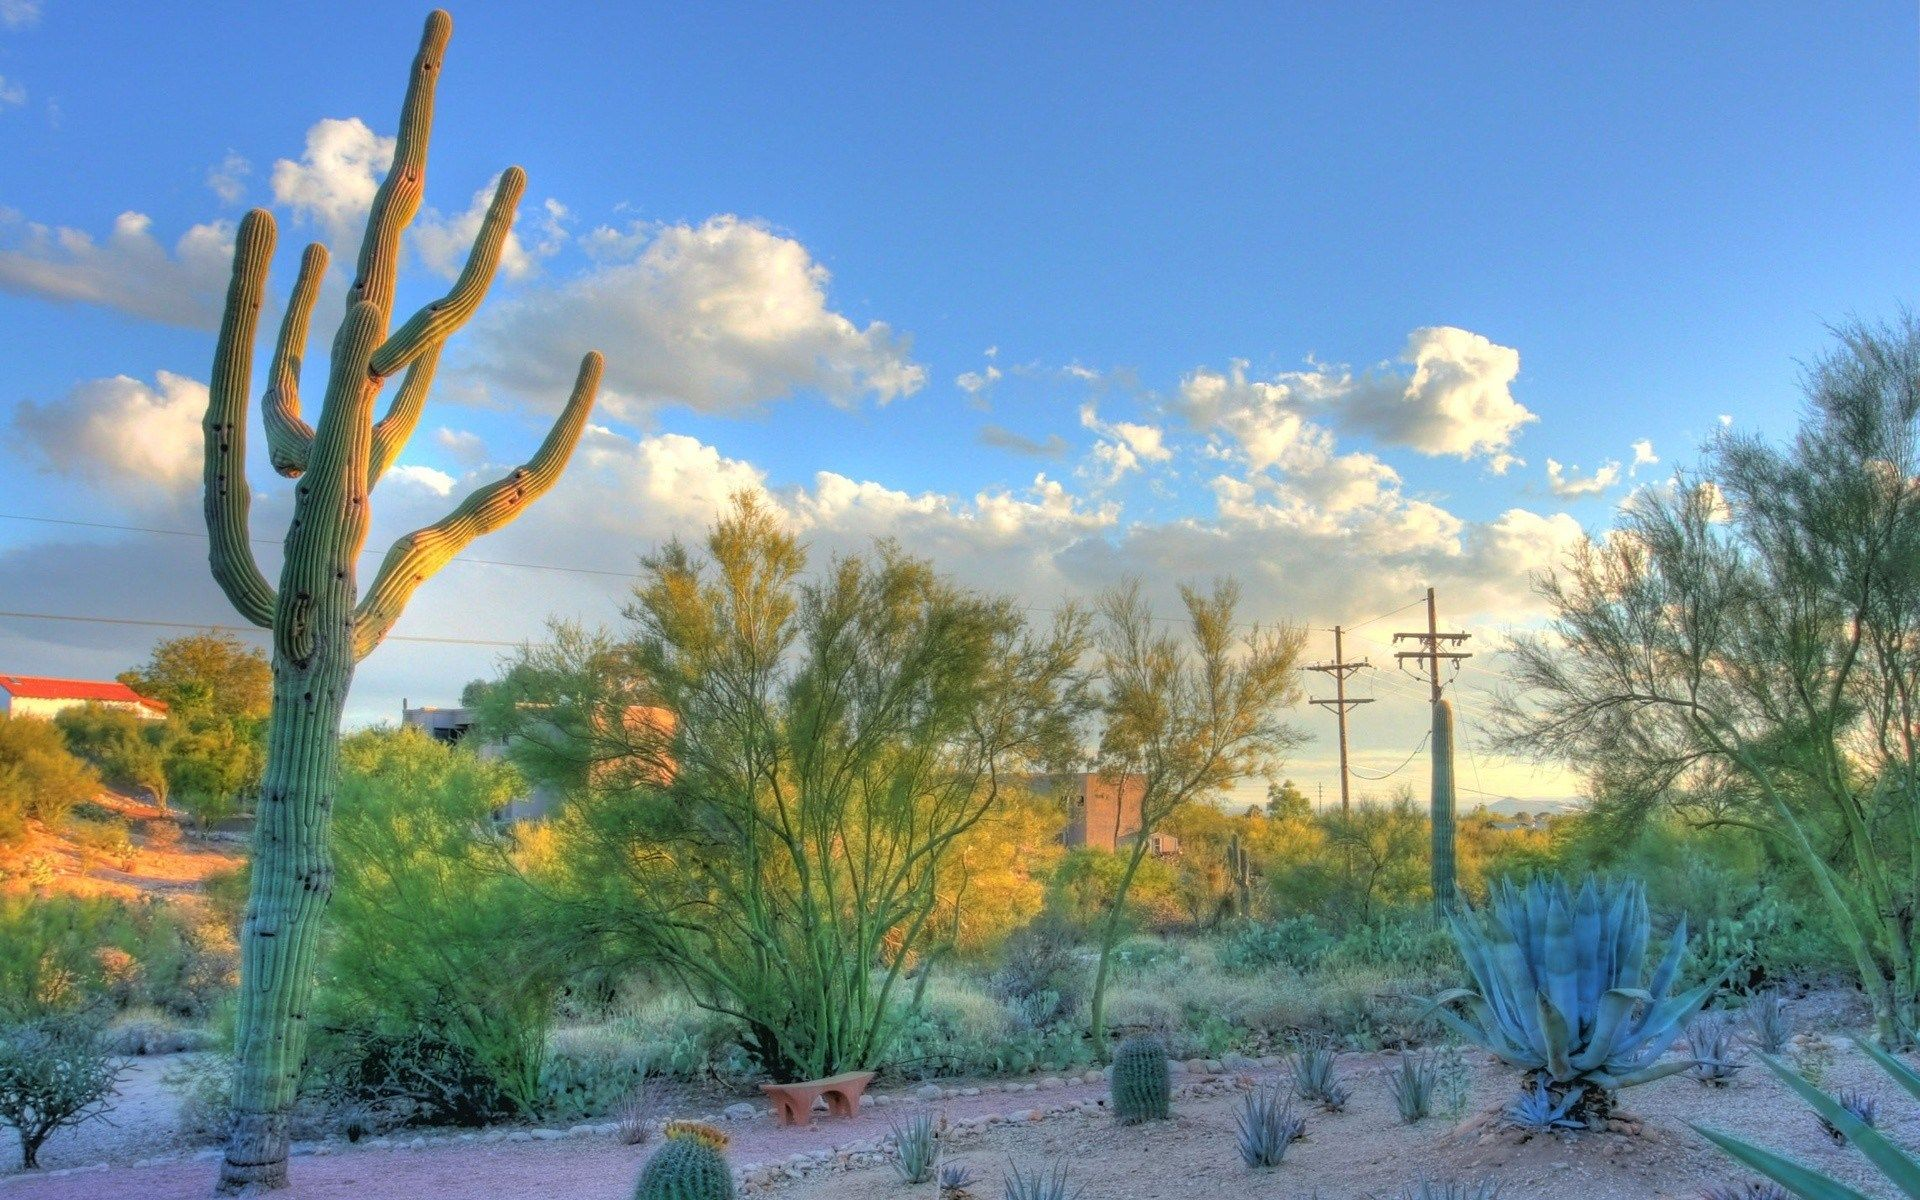 Mesmerizing Cochise County, AZ!